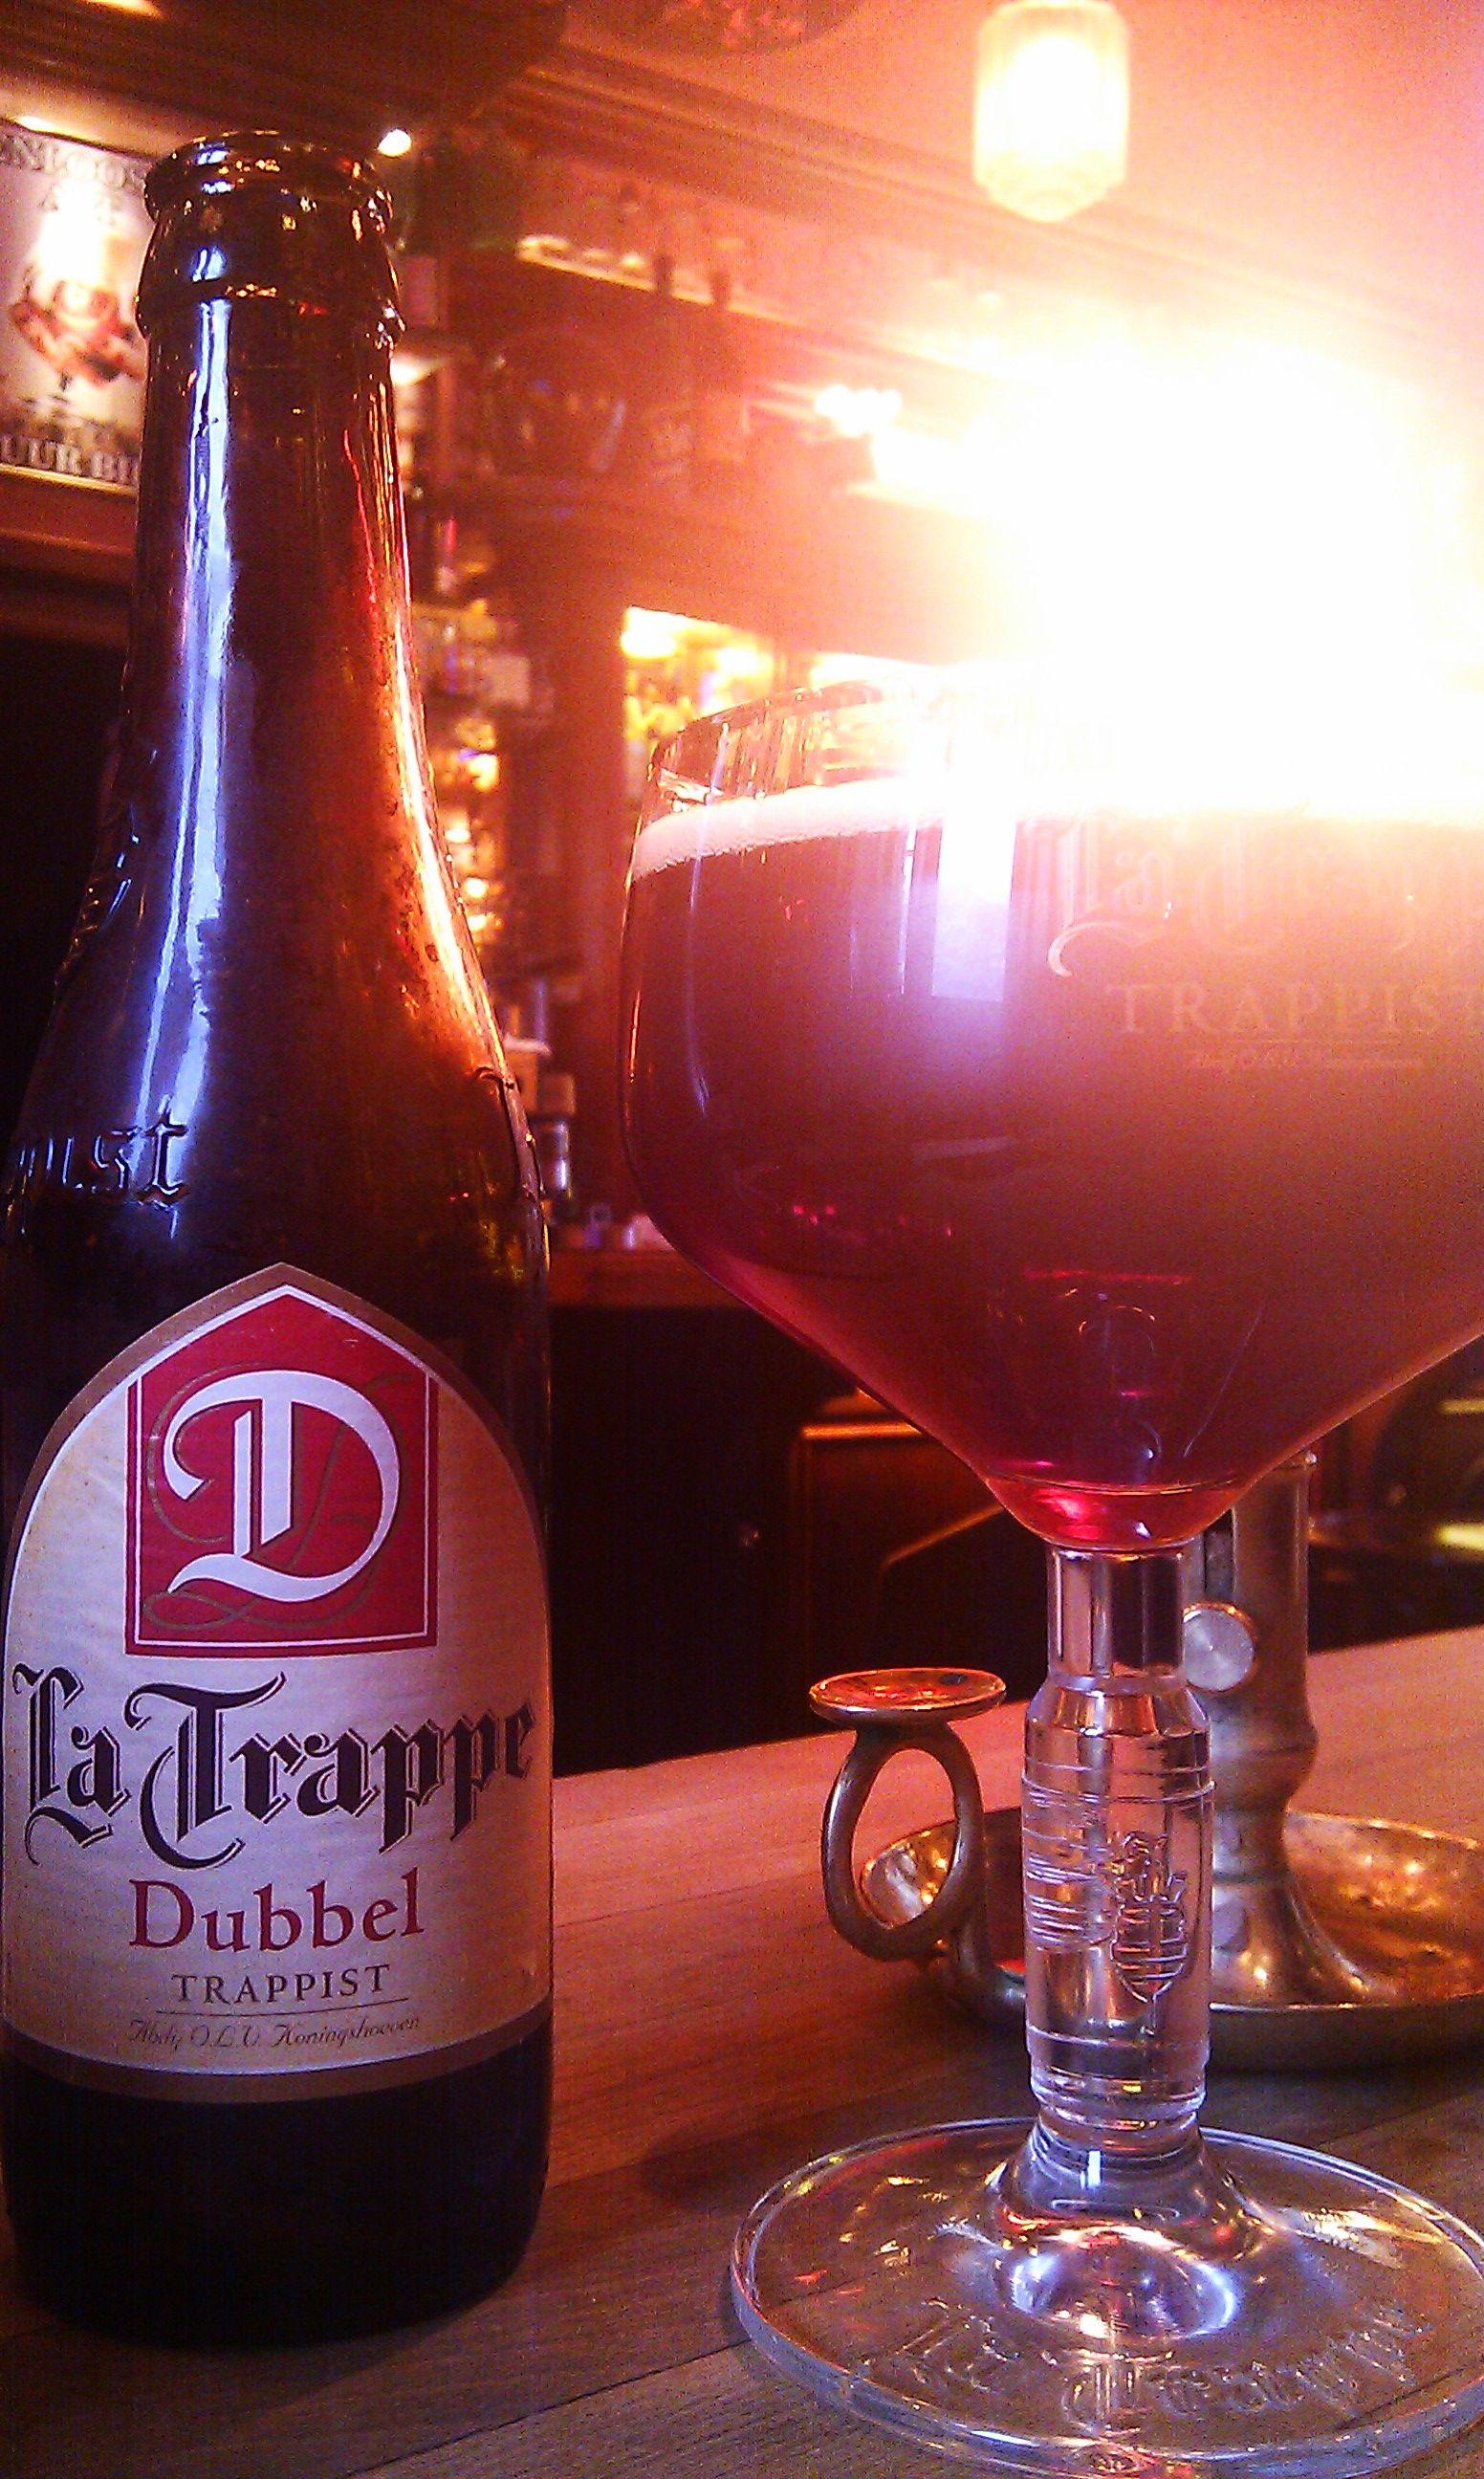 La Trappe Dubbel Trappist Drinking Beer Beer Lovers Beer